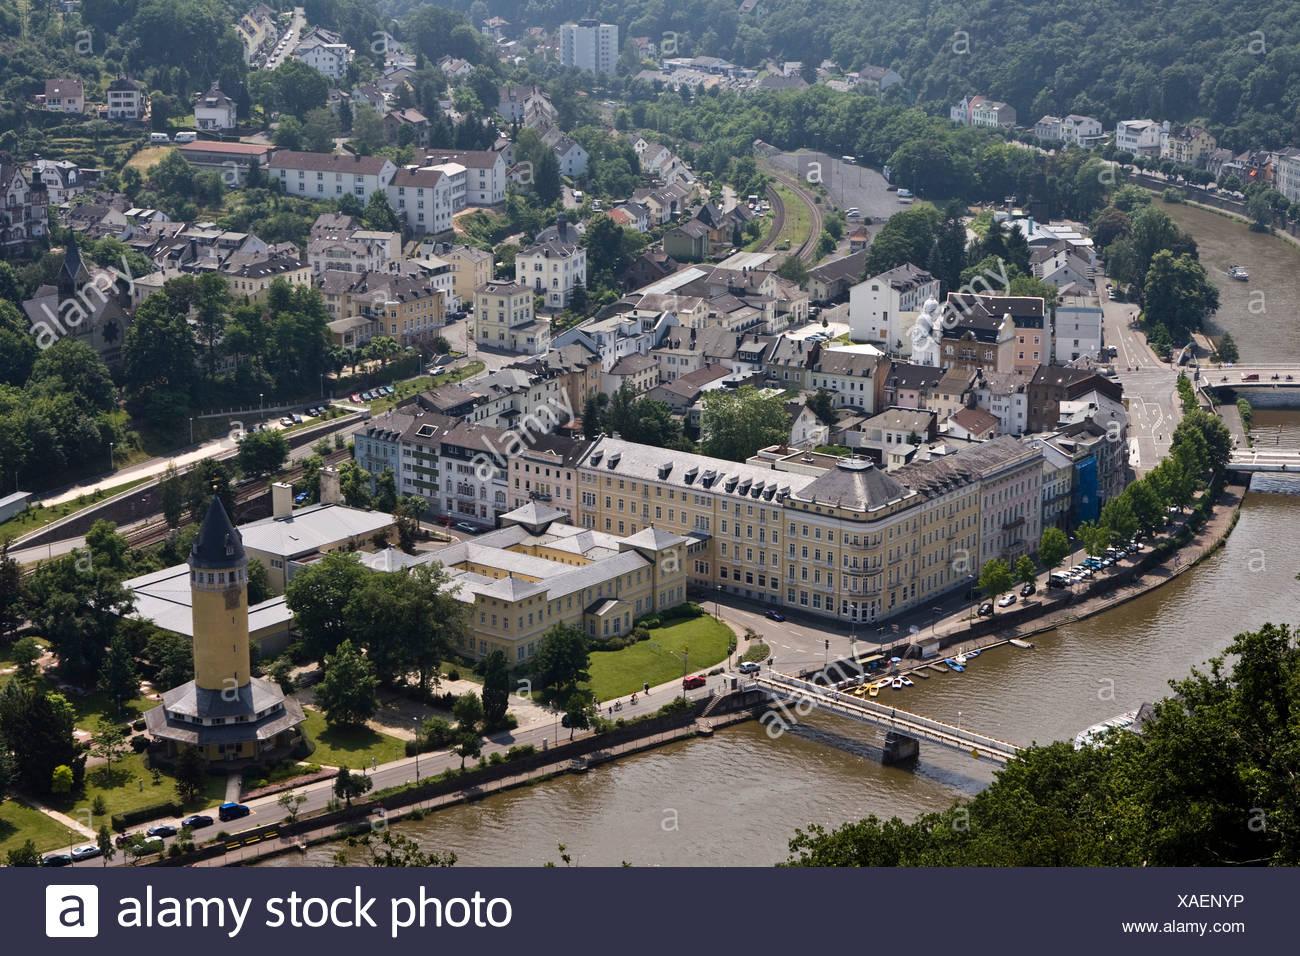 Statistisches Landesamt, Statistical Regional Office, Bad Ems, Rhineland-Palatinate, Germany, Europe - Stock Image